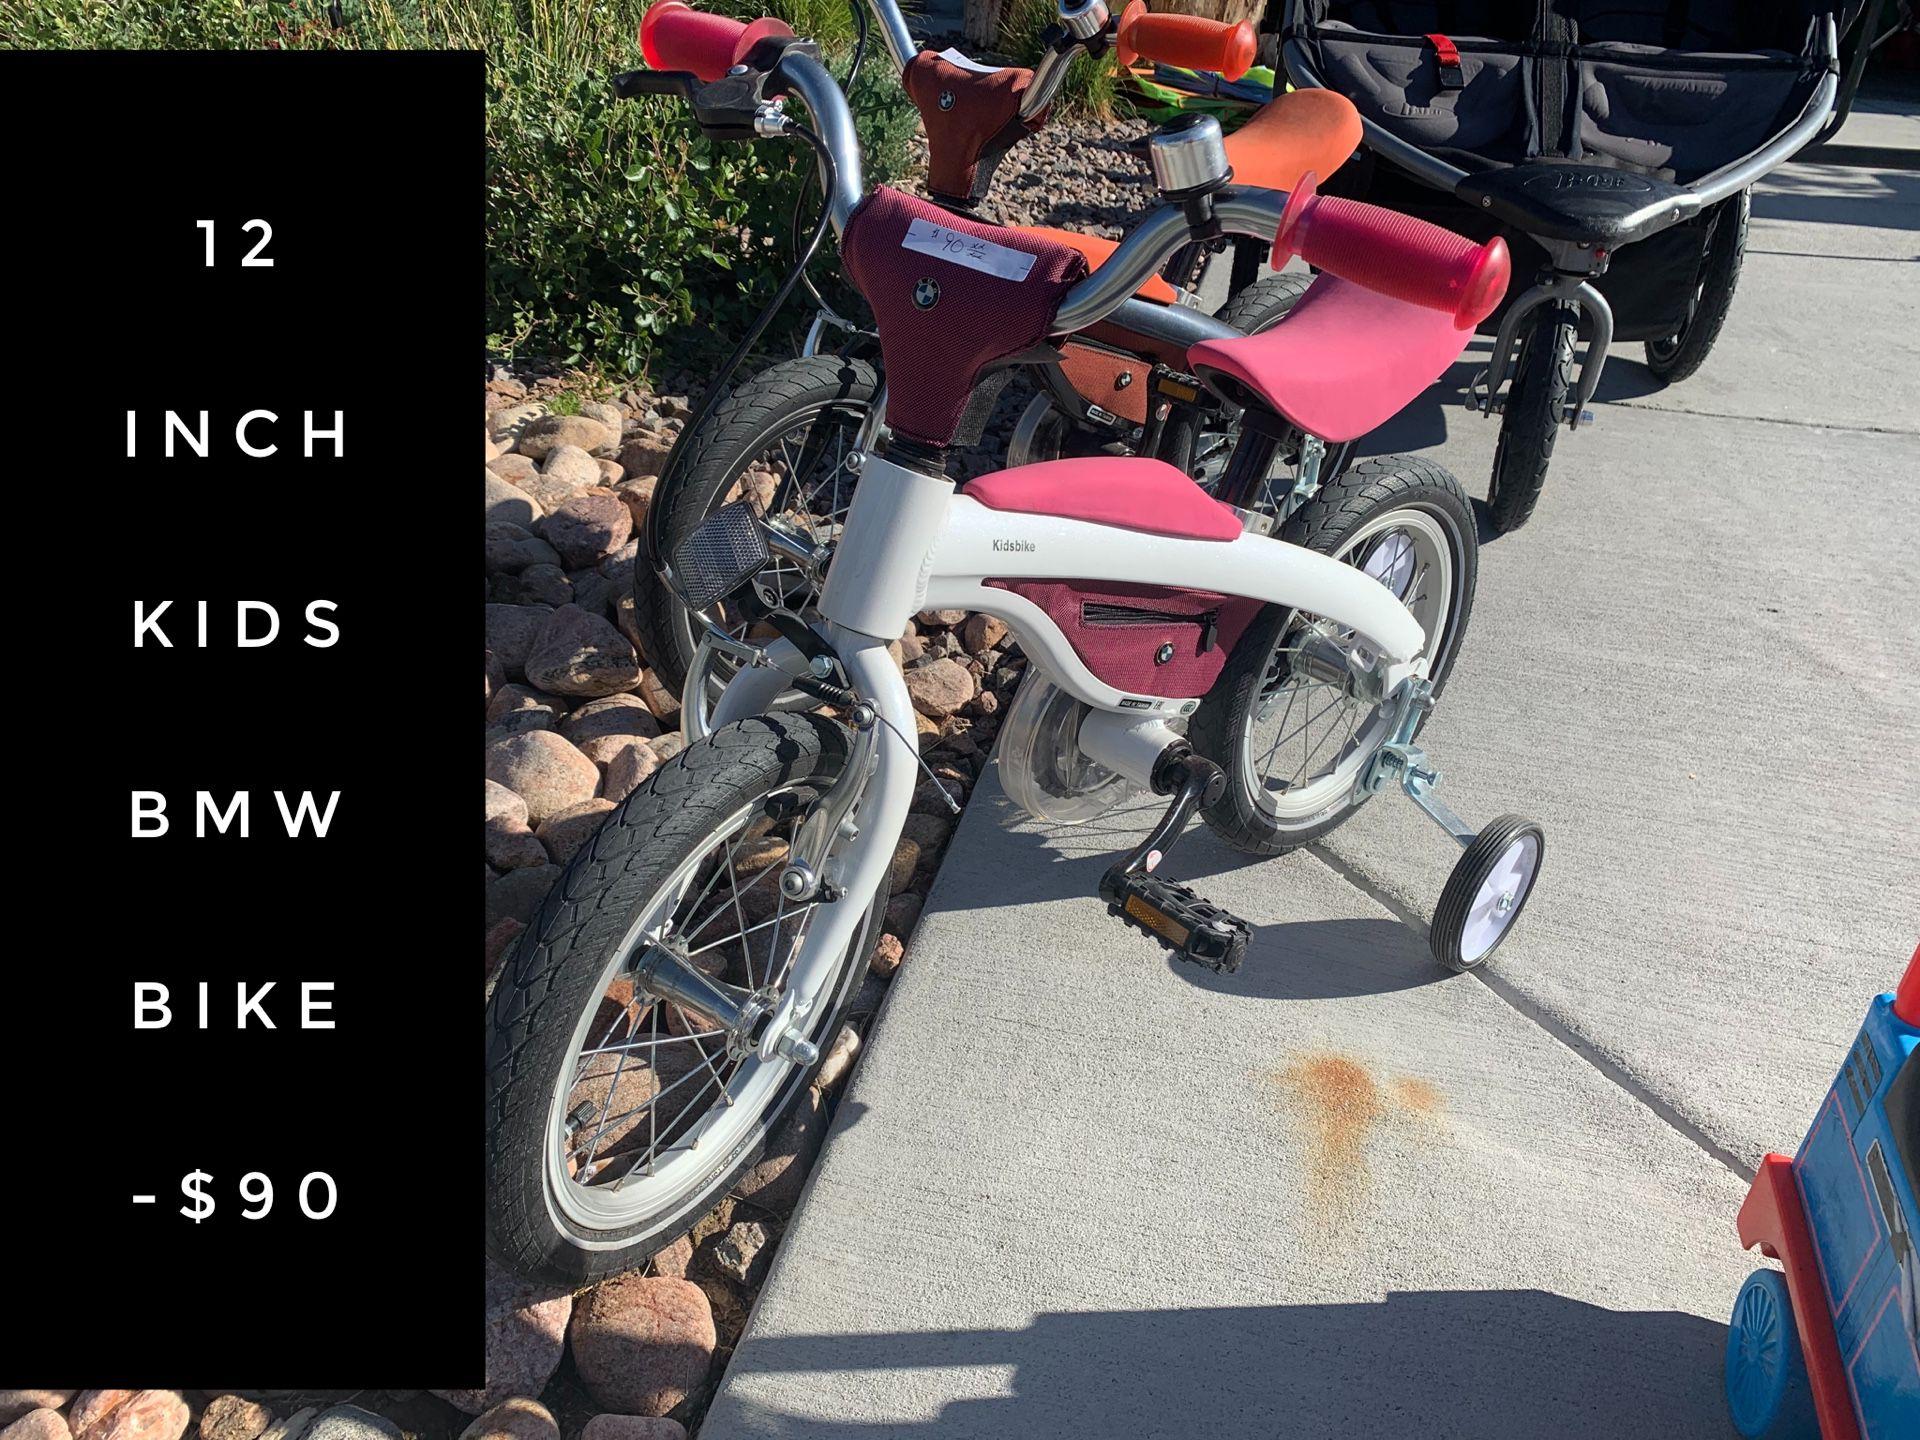 12 inch BMW bike